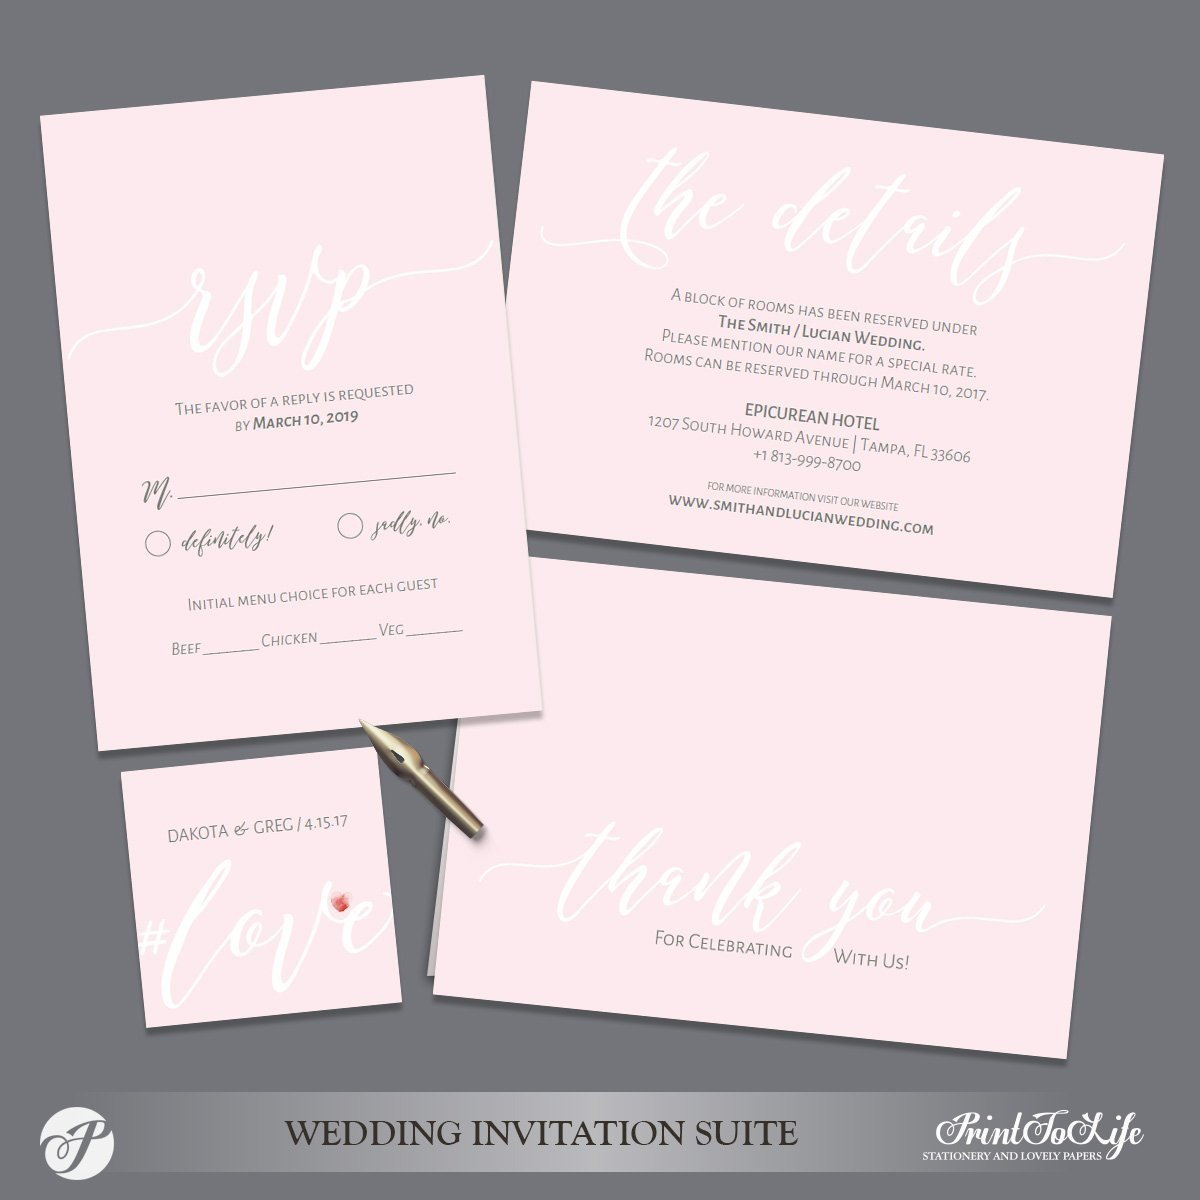 Blush Wedding Enclosure Cards by Printolife